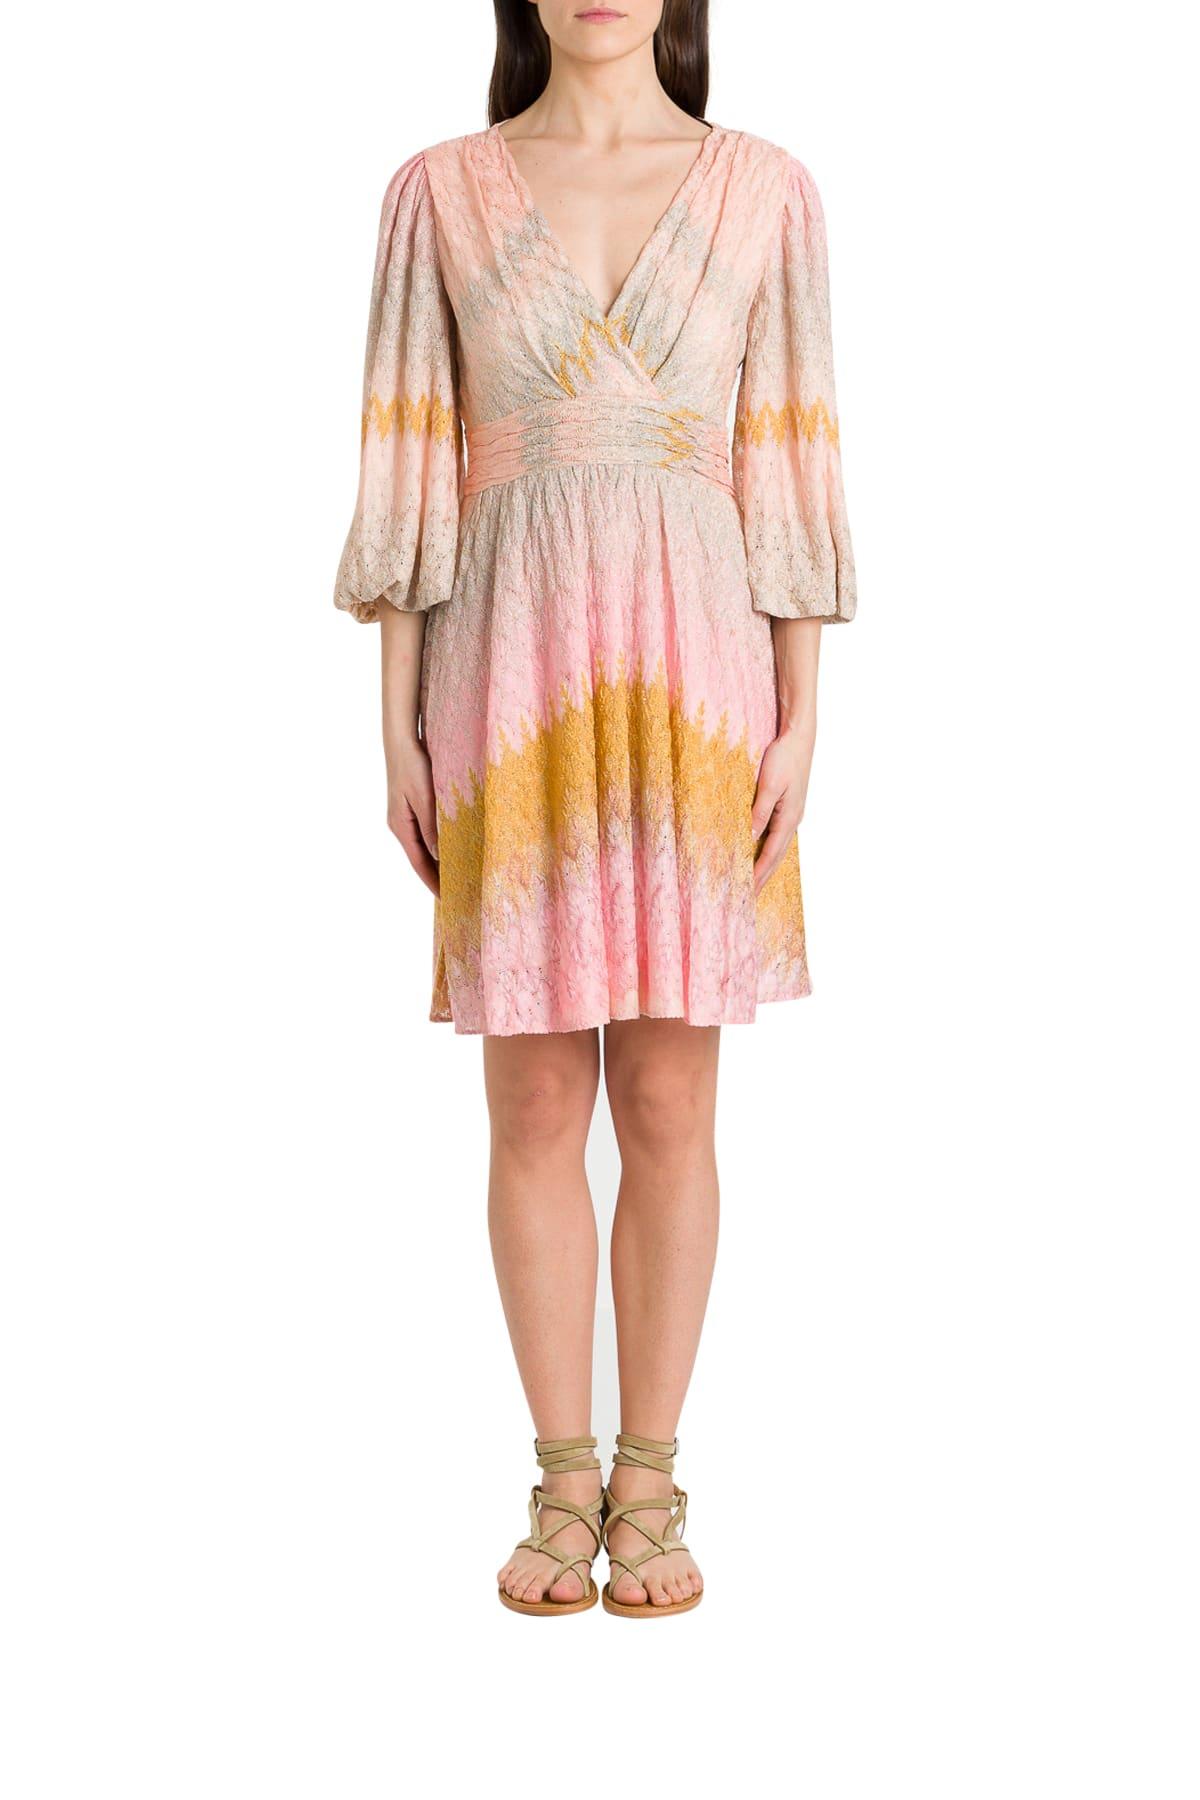 Buy Missoni Lurex Knit Dress online, shop Missoni with free shipping